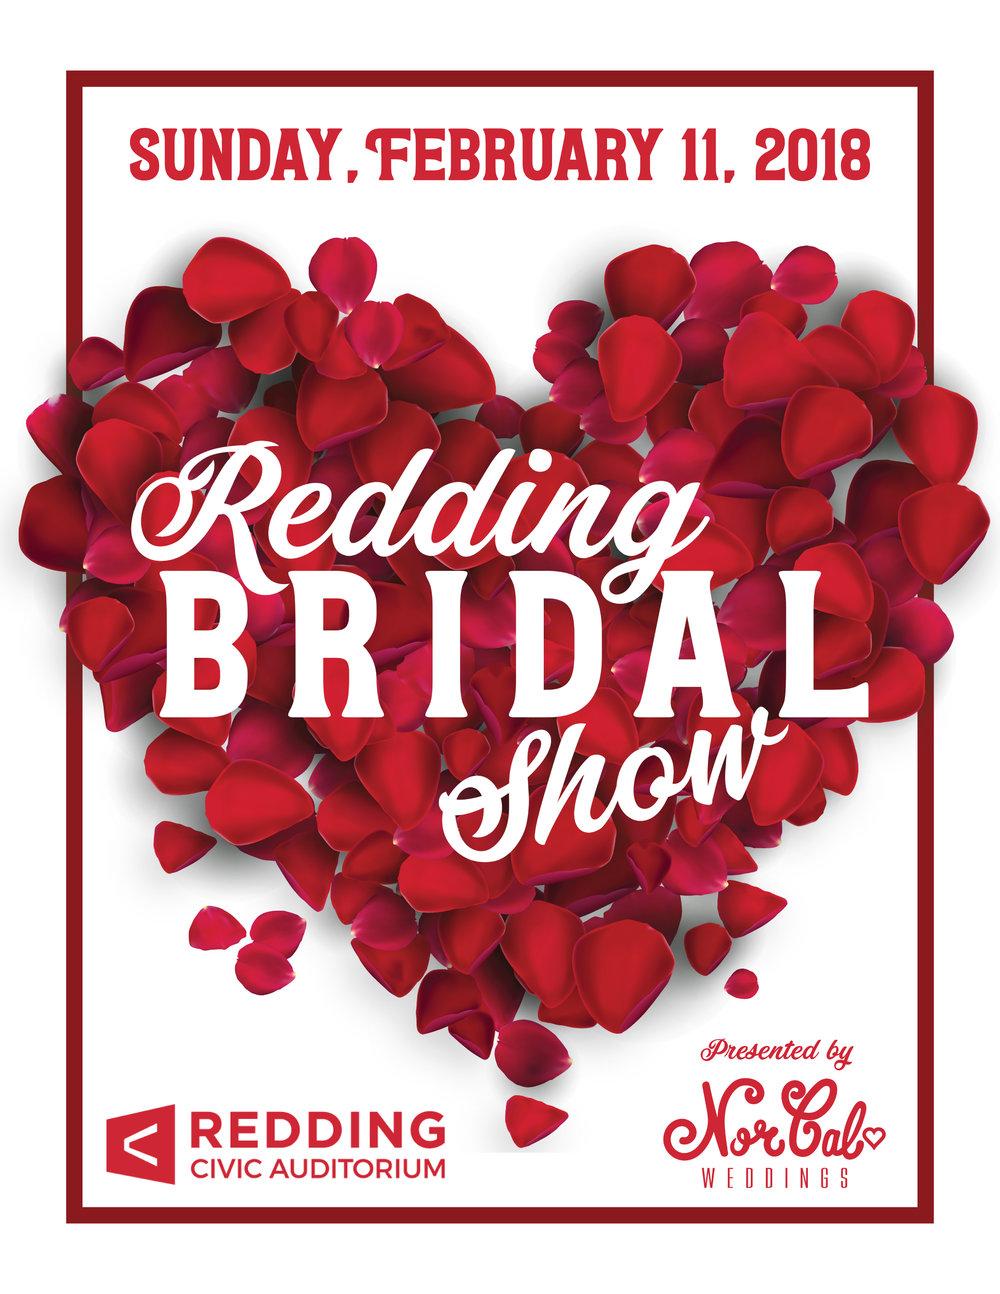 NorCal Weddings Redding Bridal Show.jpg